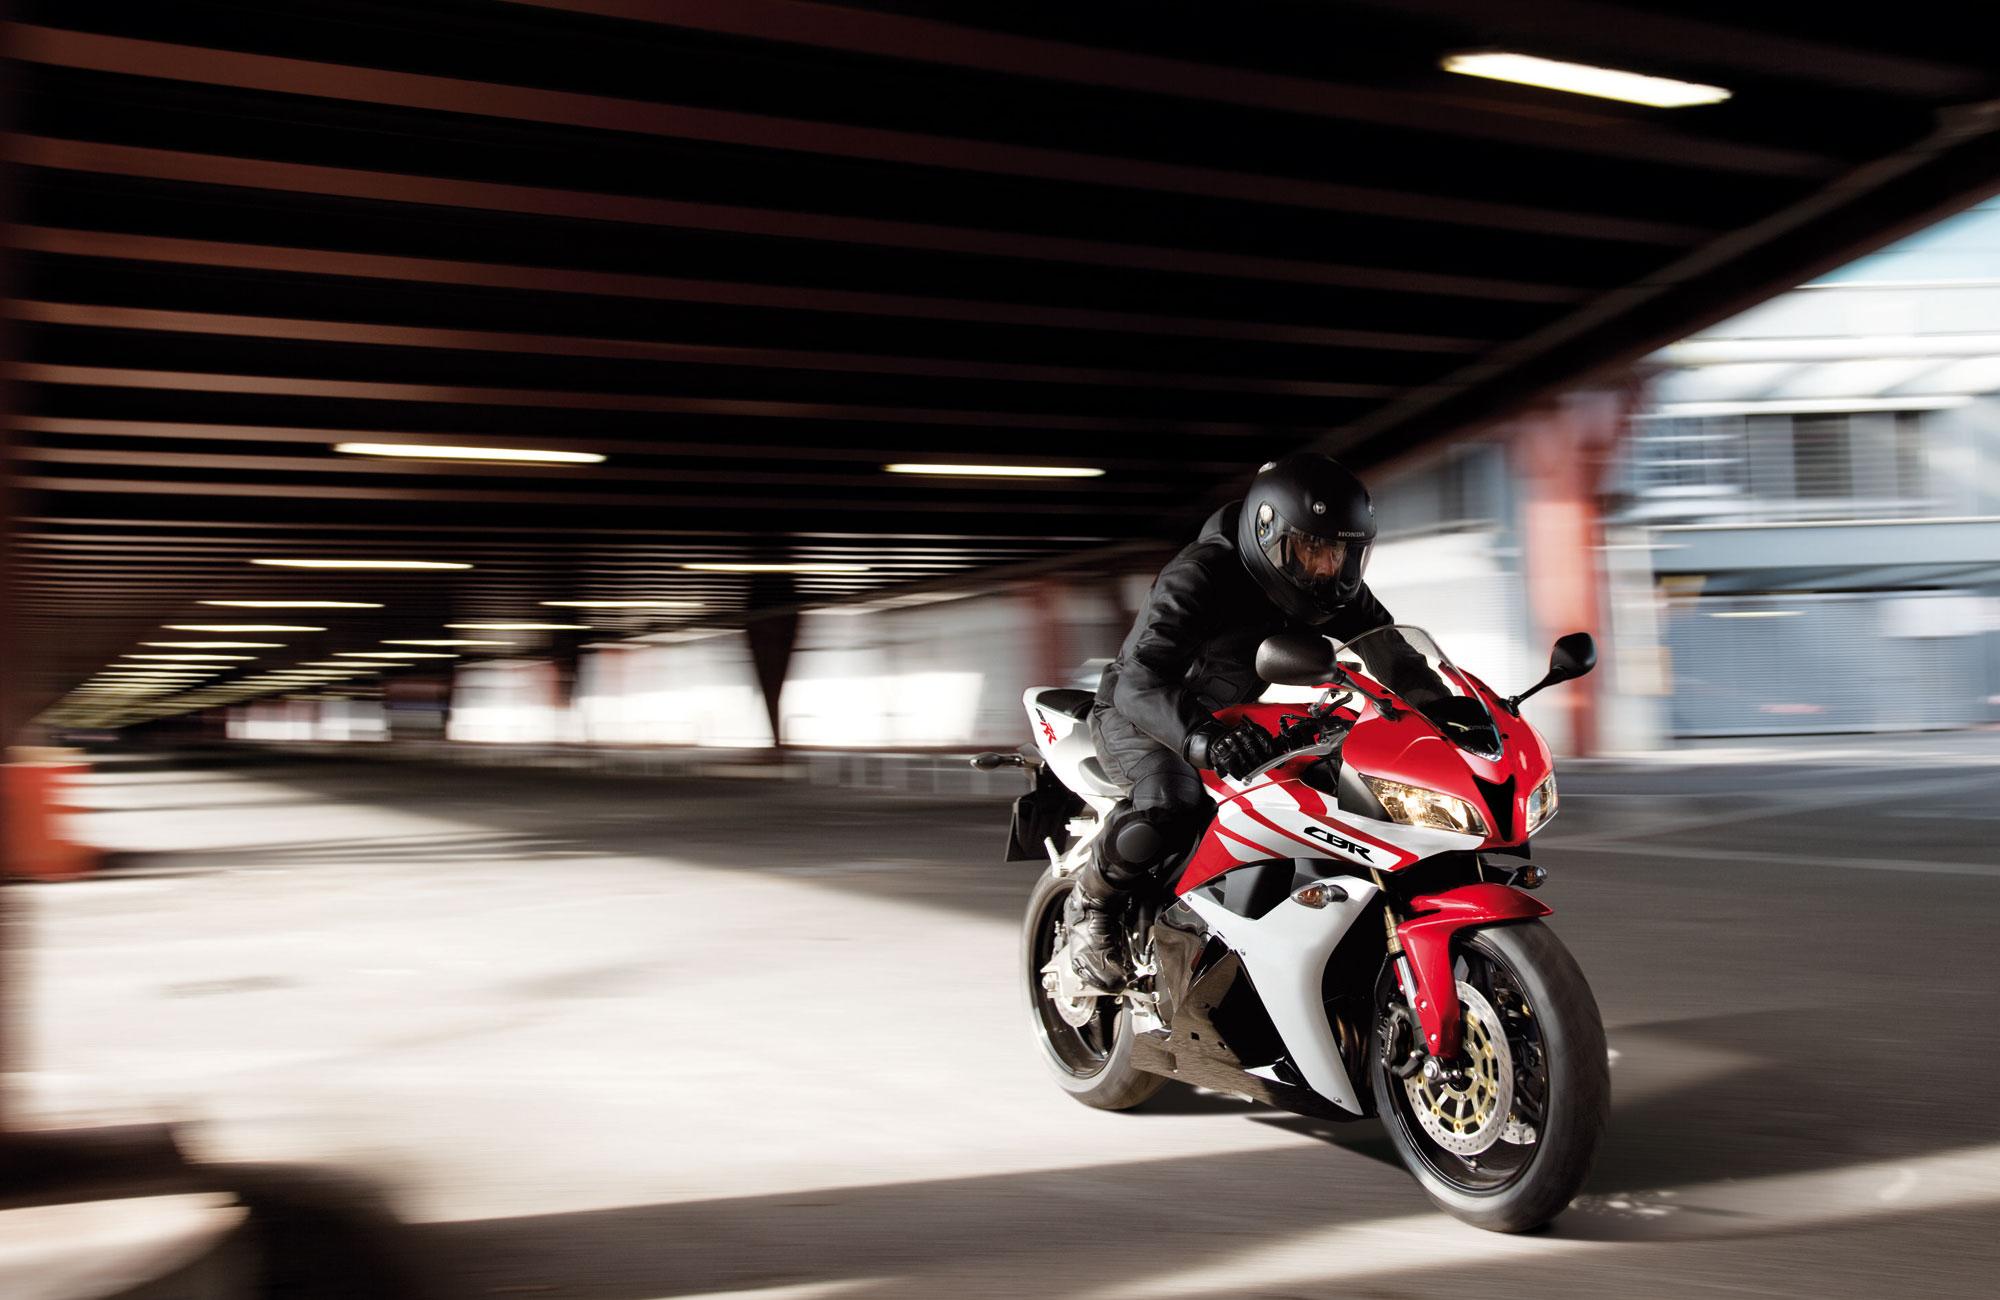 2011 honda cbr 600rr all new reviews - Honda Cbr 600 Rr C Abs 2011 2012